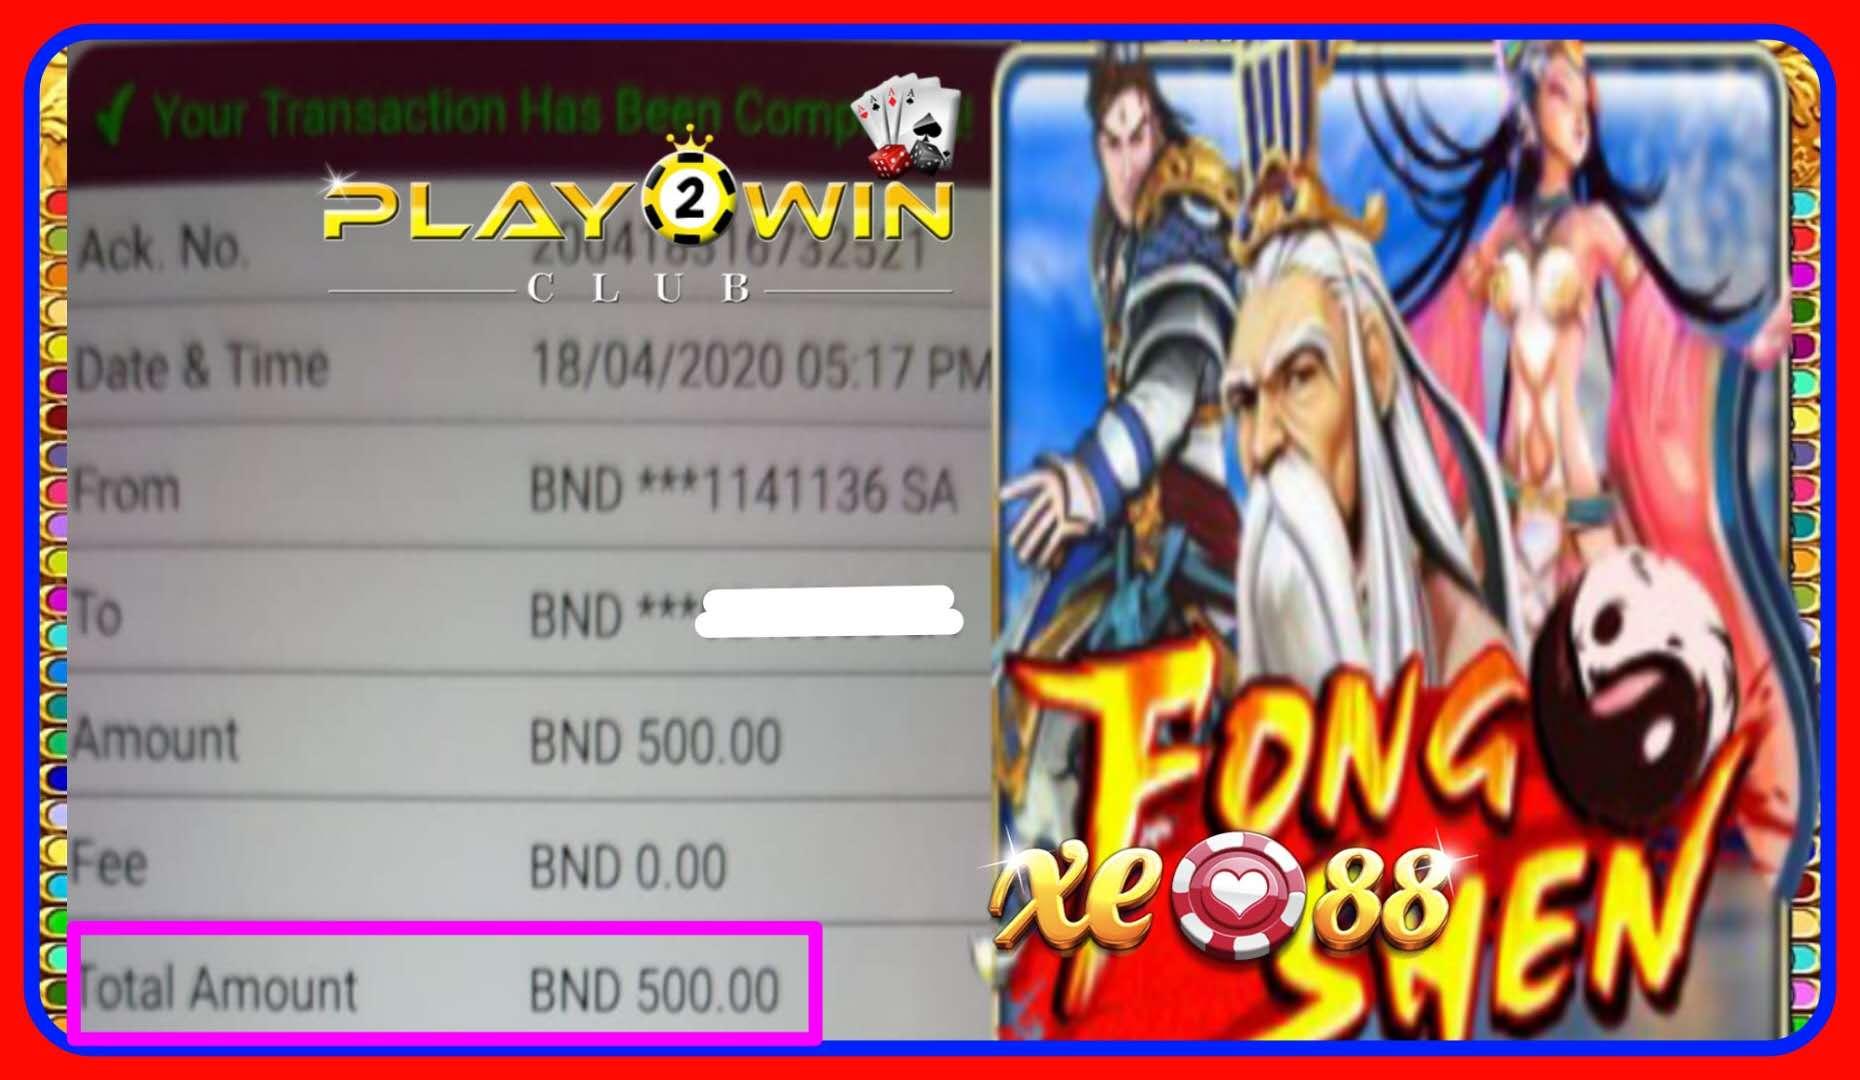 casino online malaysia play2winclub winn